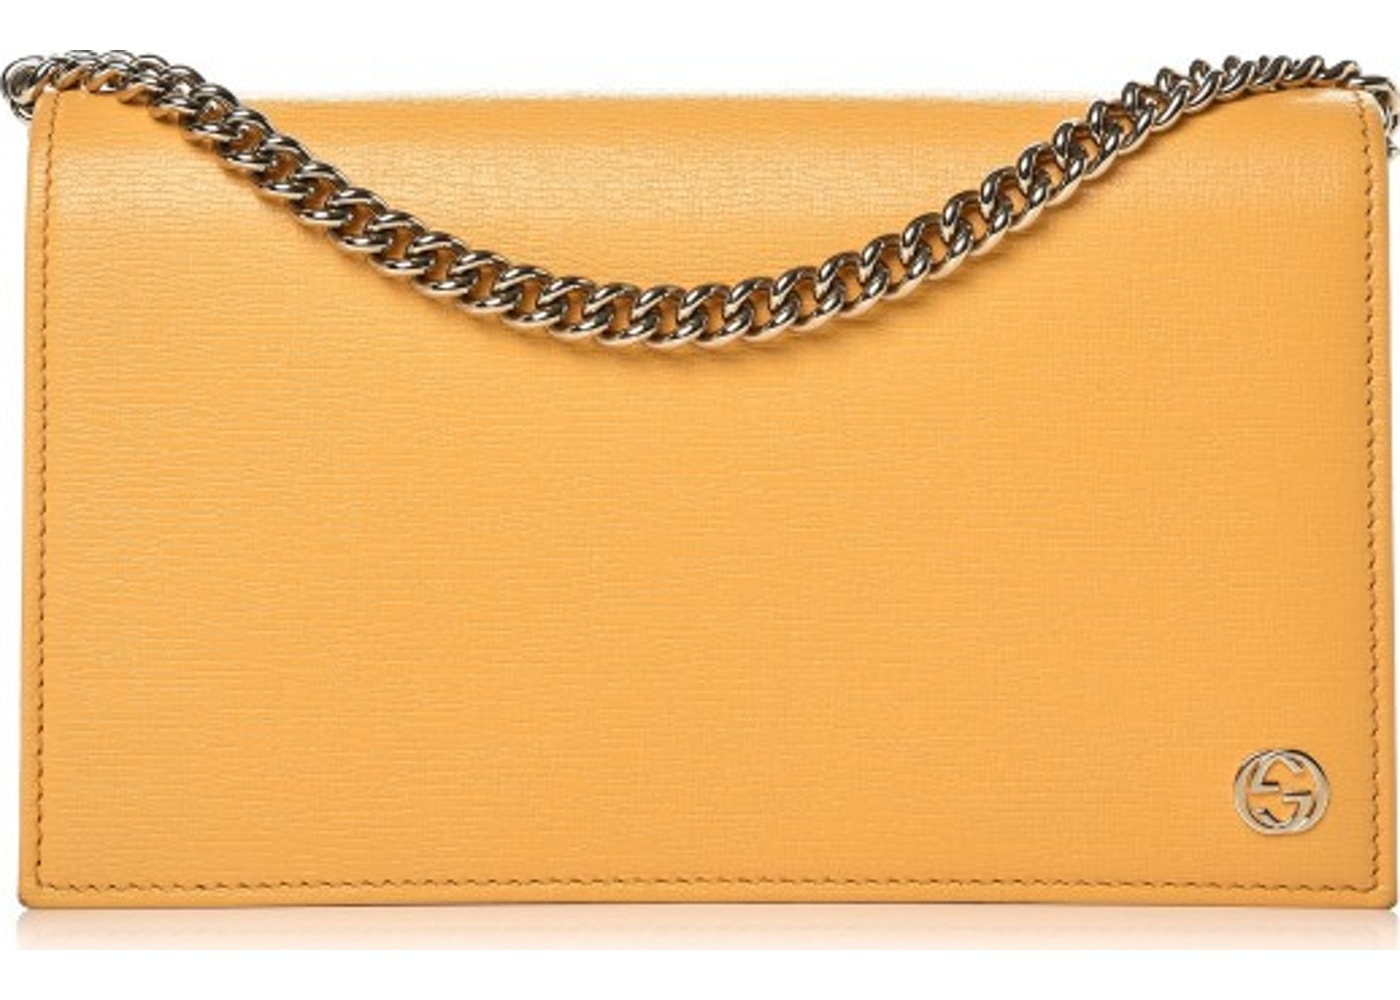 fb113c664040 Gucci Betty Chain Wallet Interlocking GG Medium Yellow. Interlocking GG  Medium Yellow